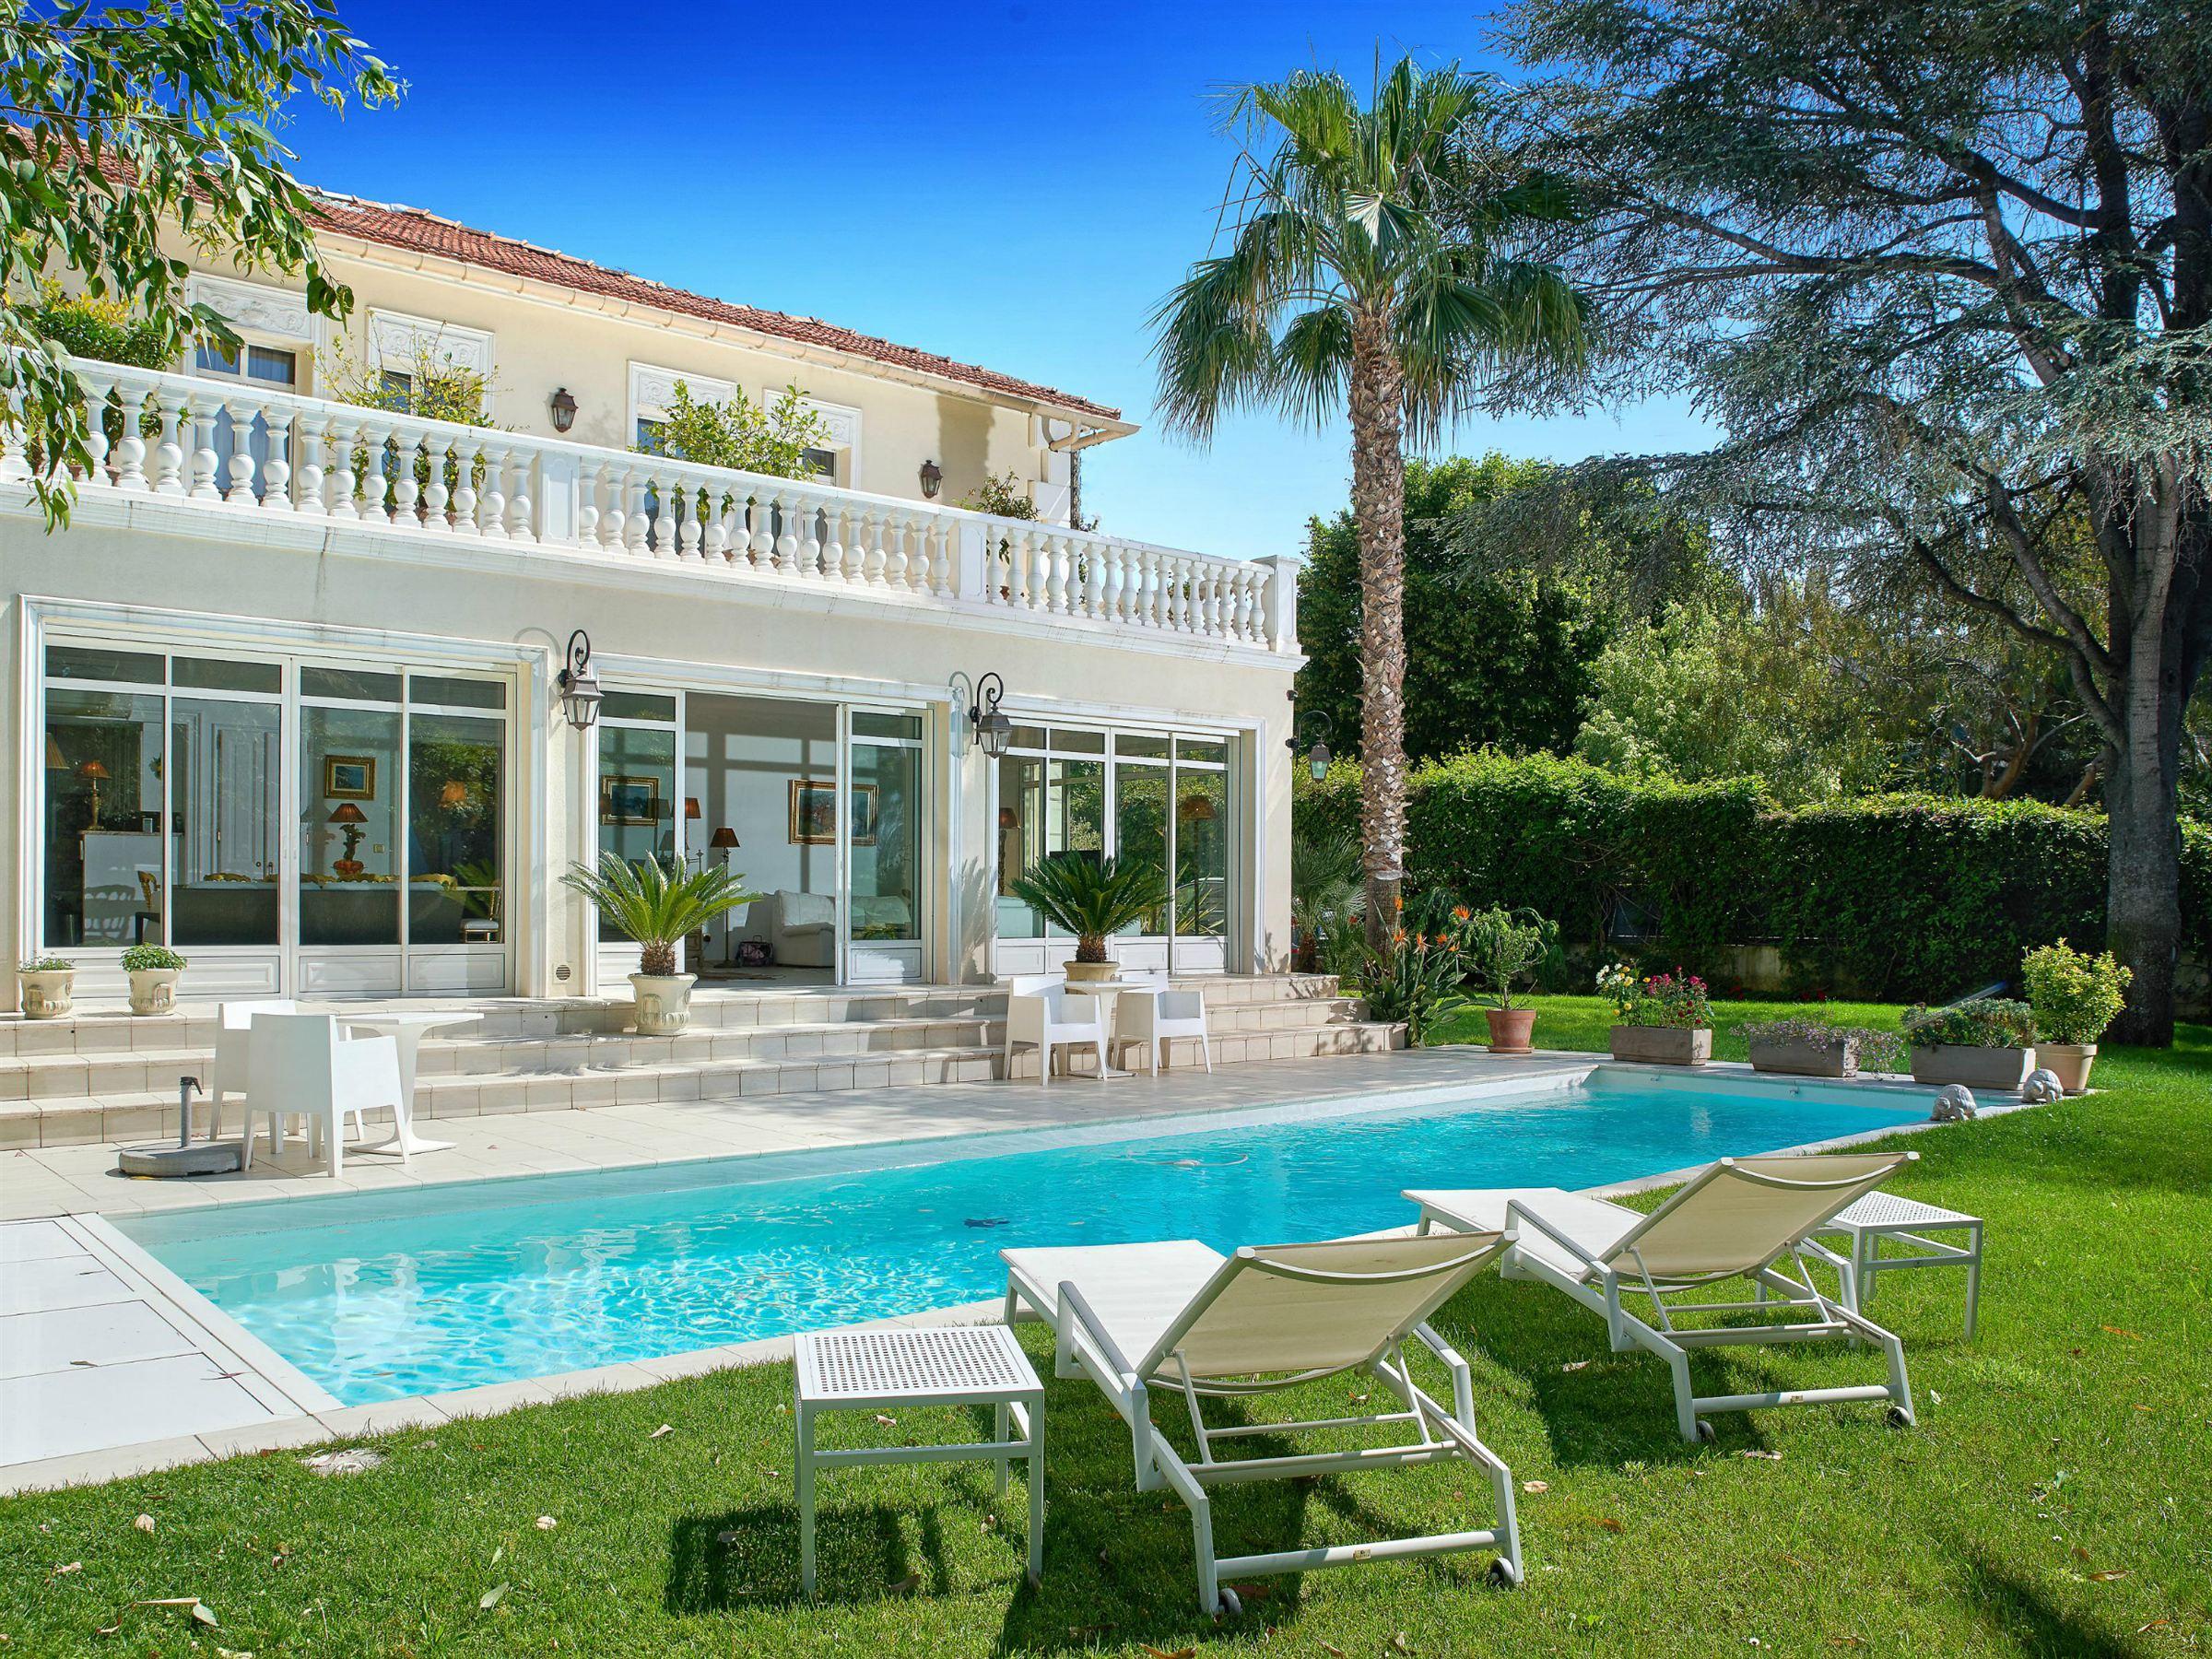 Nhà ở một gia đình vì Bán tại Charming villa located in the sought after 'Basse Californie' in Cannes Cannes, Provence-Alpes-Cote D'Azur 06400 Pháp